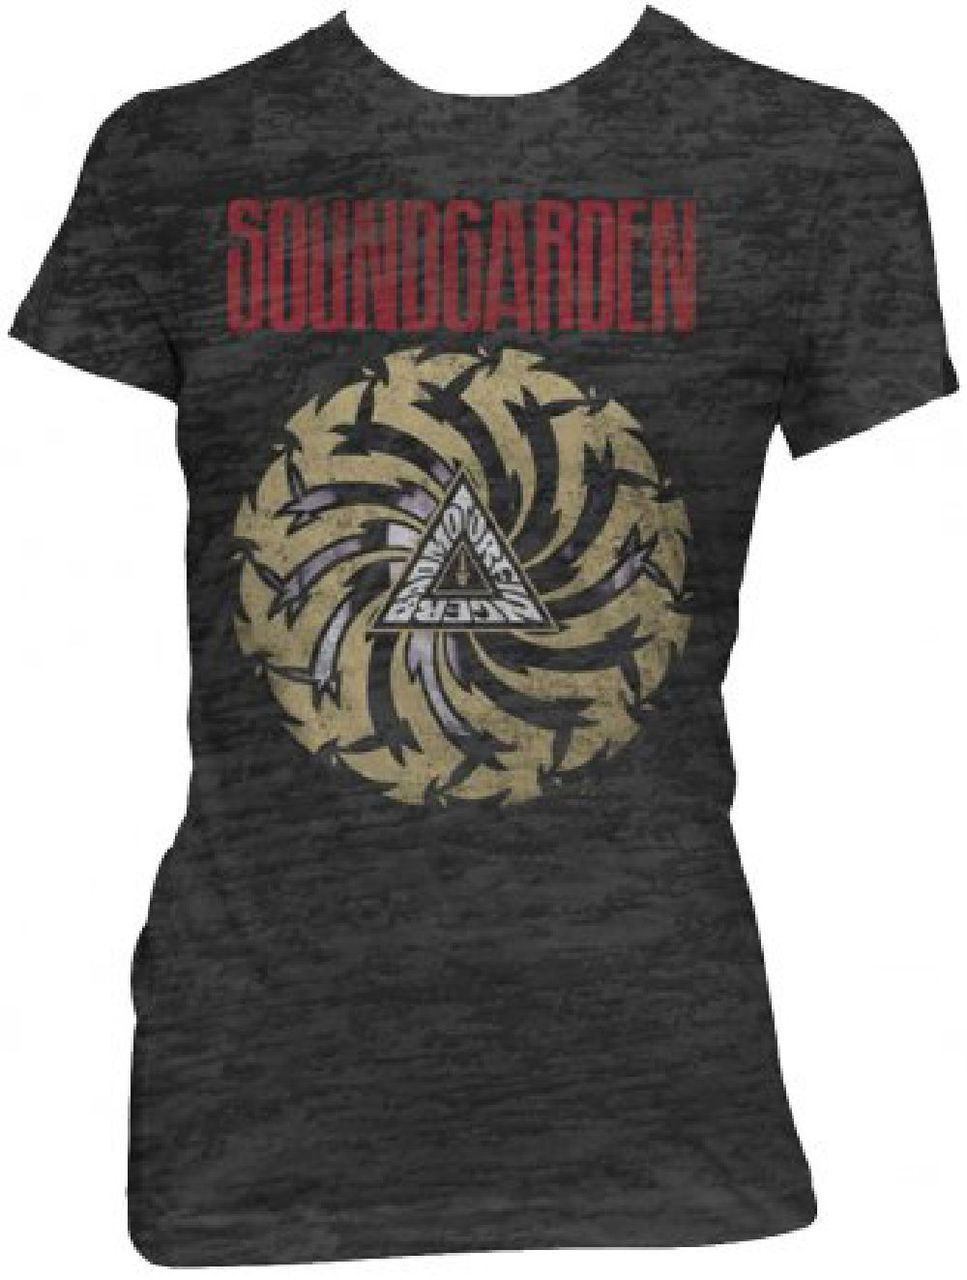 Gallery images and information soundgarden badmotorfinger tattoo - Soundgarden Women S Vintage T Shirt Badmotorfinger Album Cover Artwork Black